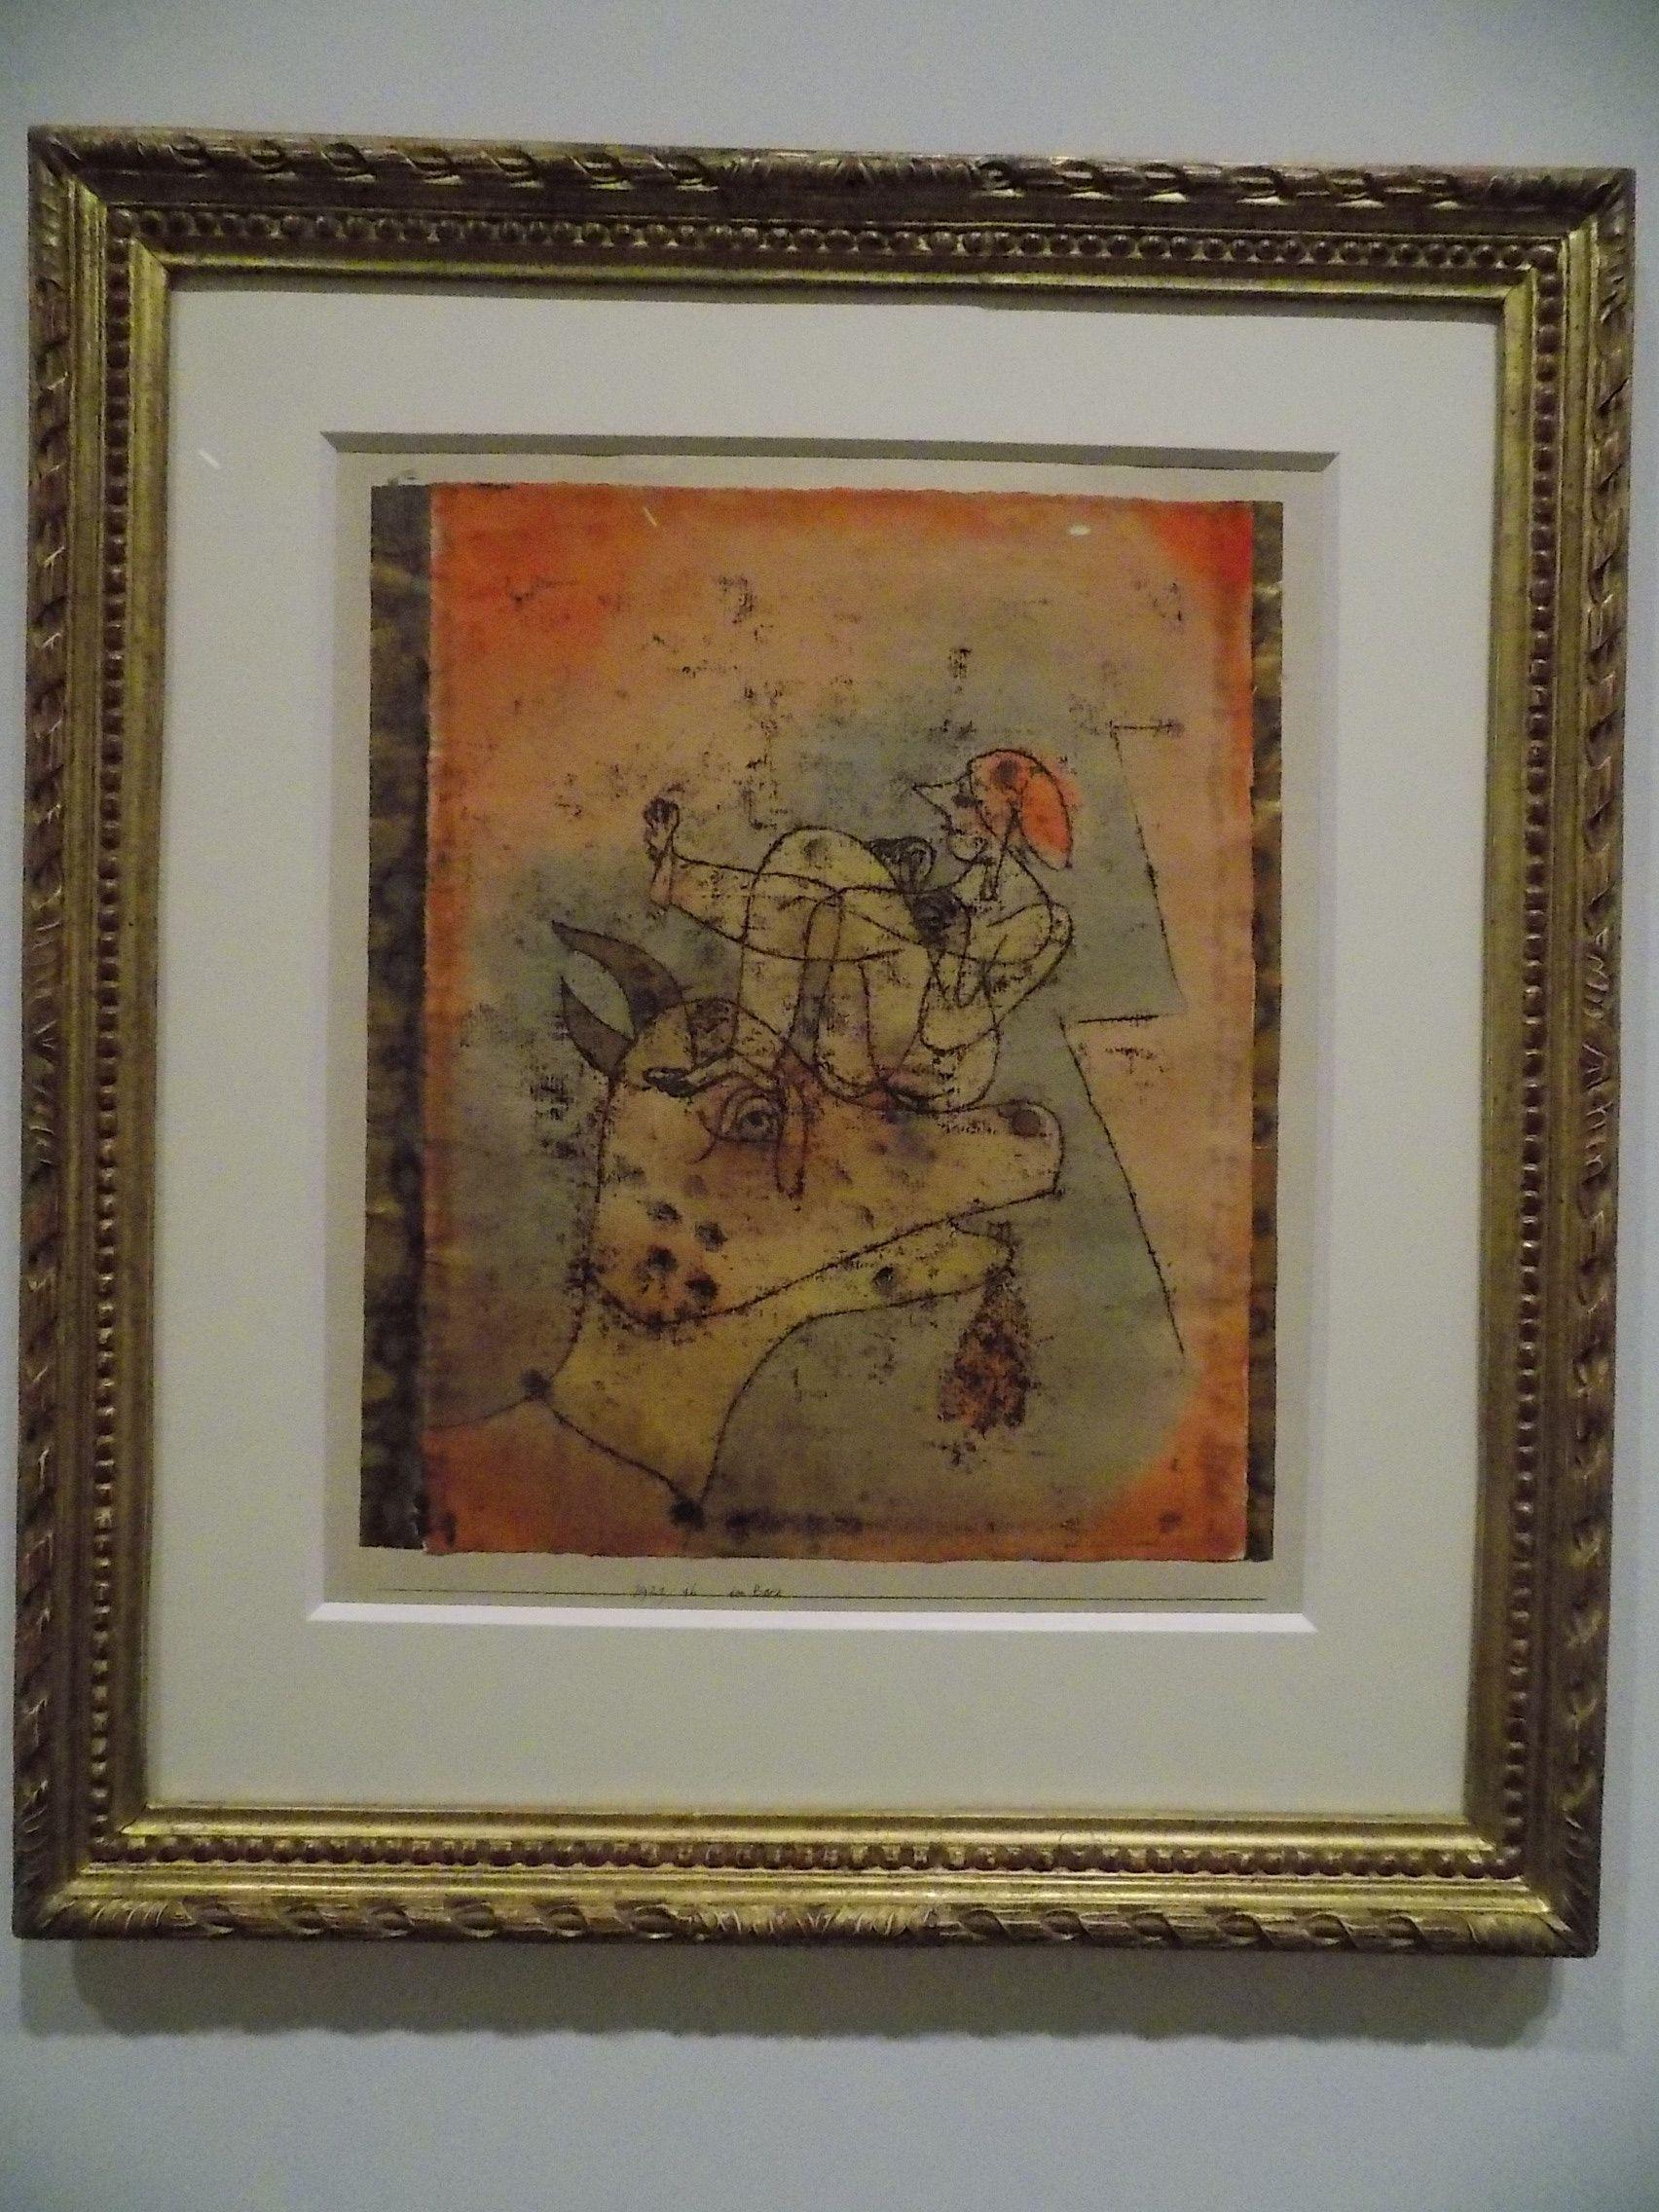 Paul Klee: não lembro o título...